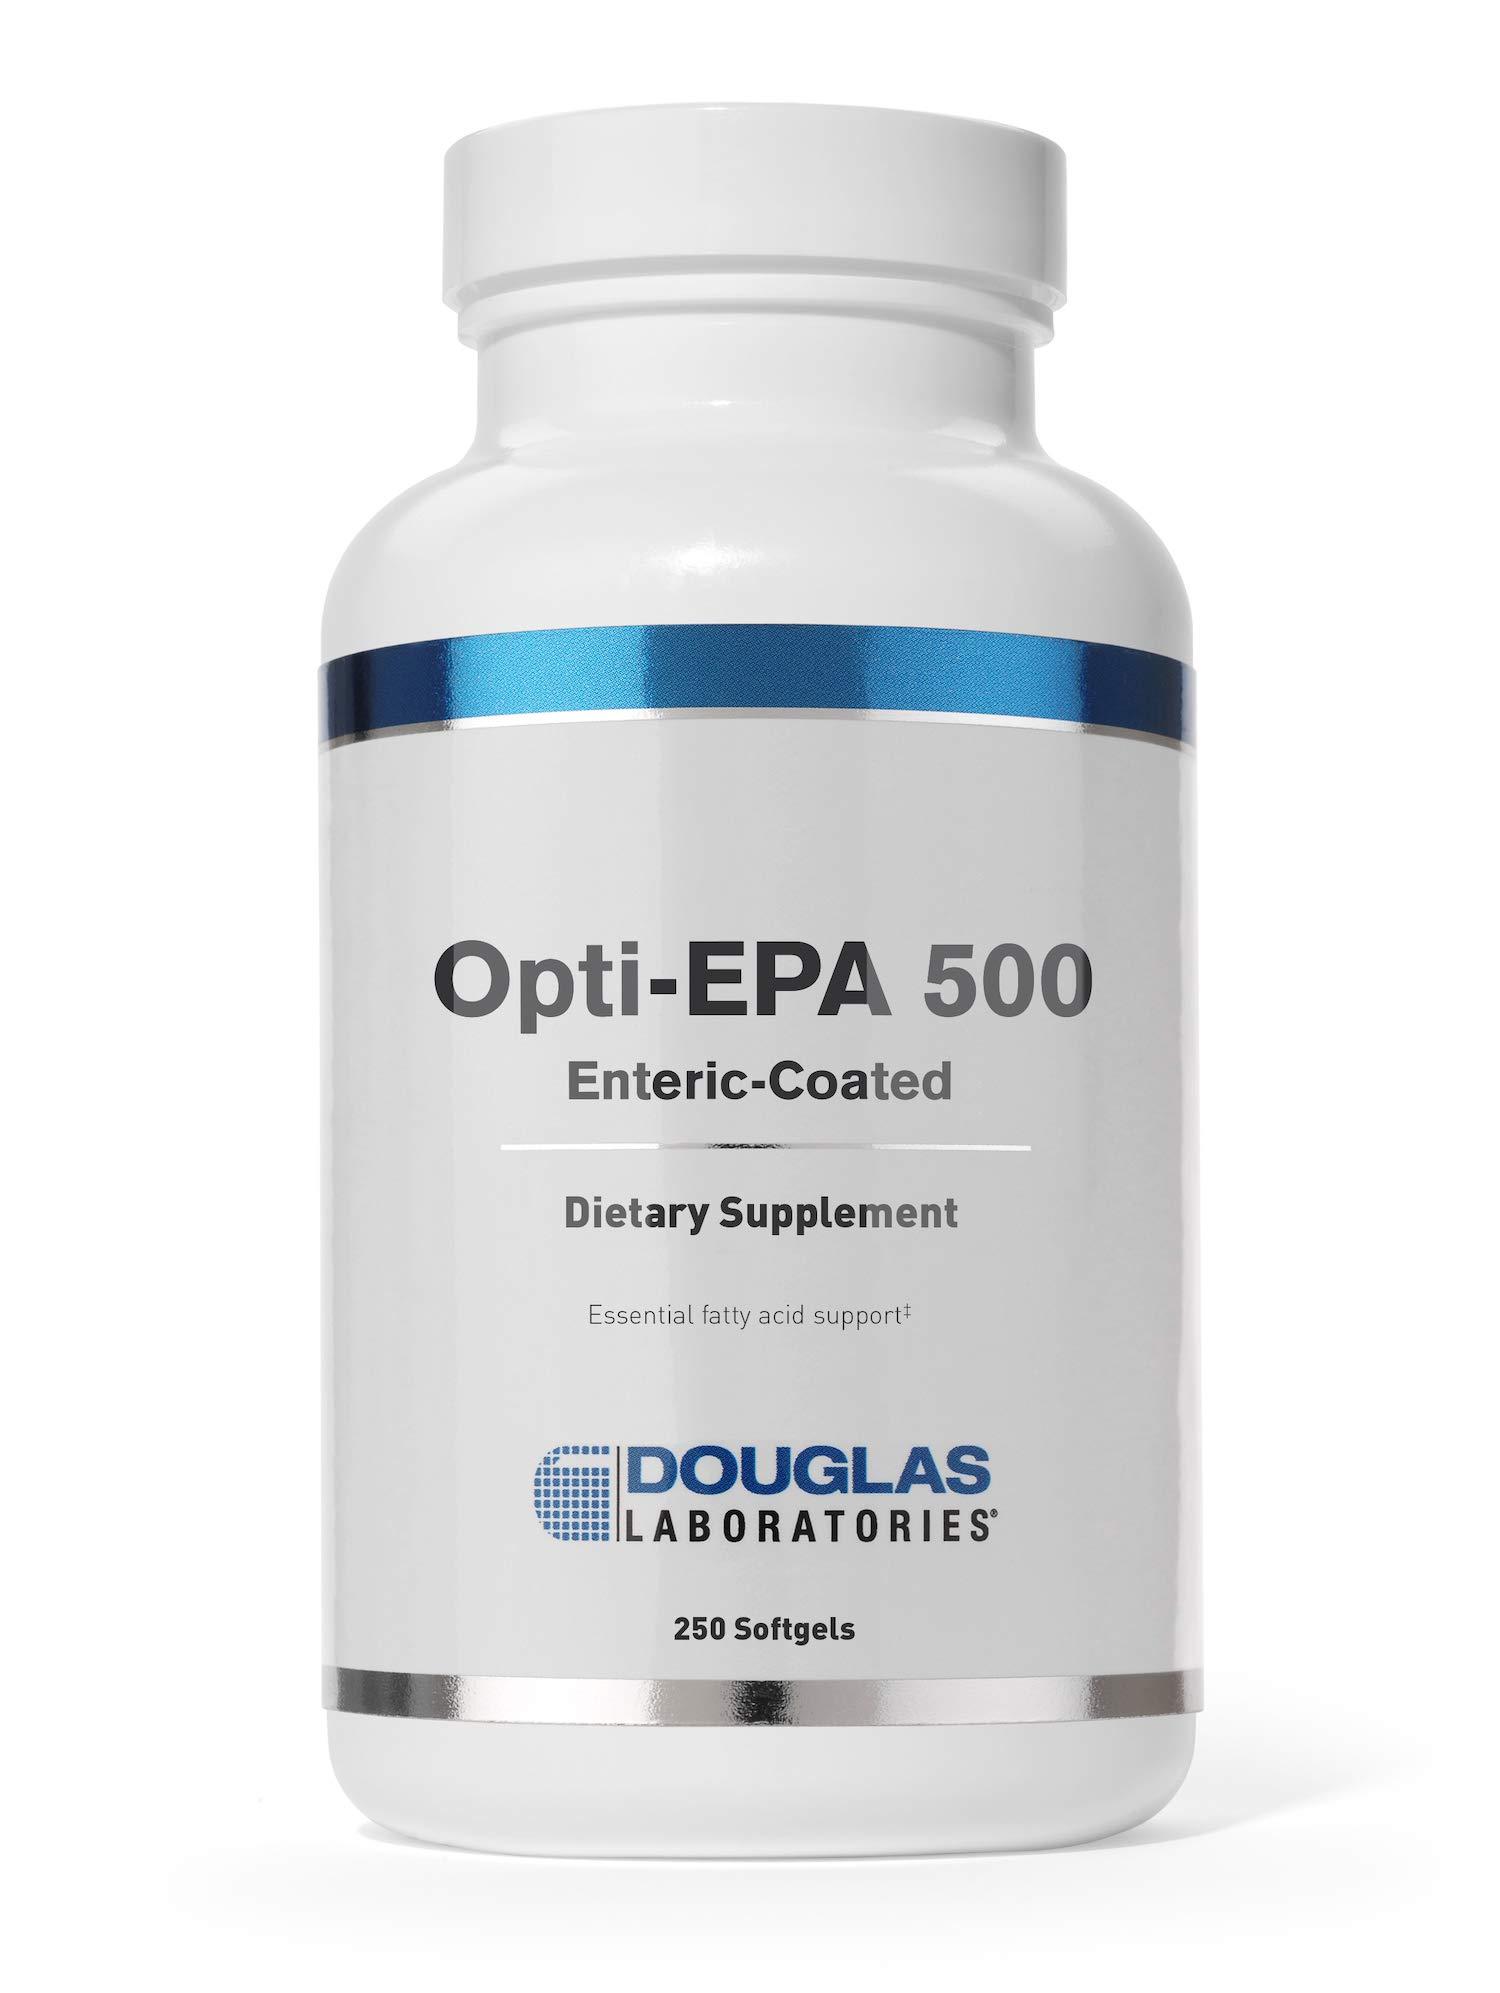 Douglas Laboratories - Opti-EPA 500 (Cholesterol Free) - Supports Brain, Eyes, Pregnancy and Cardiovascular Health* - 250 Softgels by Douglas Laboratories